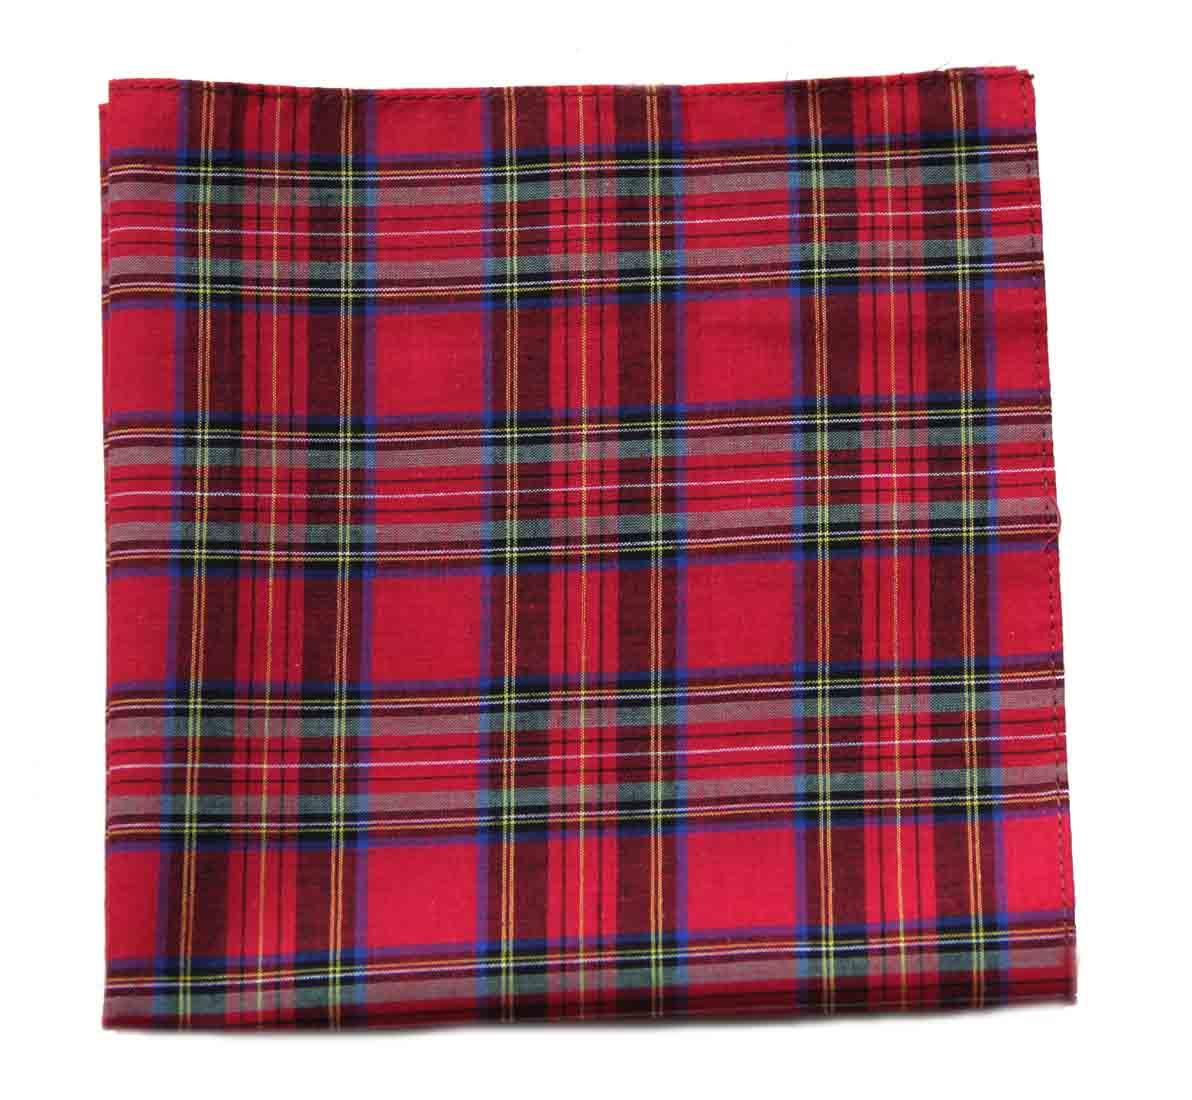 Gascoigne Pocket Square Red Scotch Plaid Cotton Men's